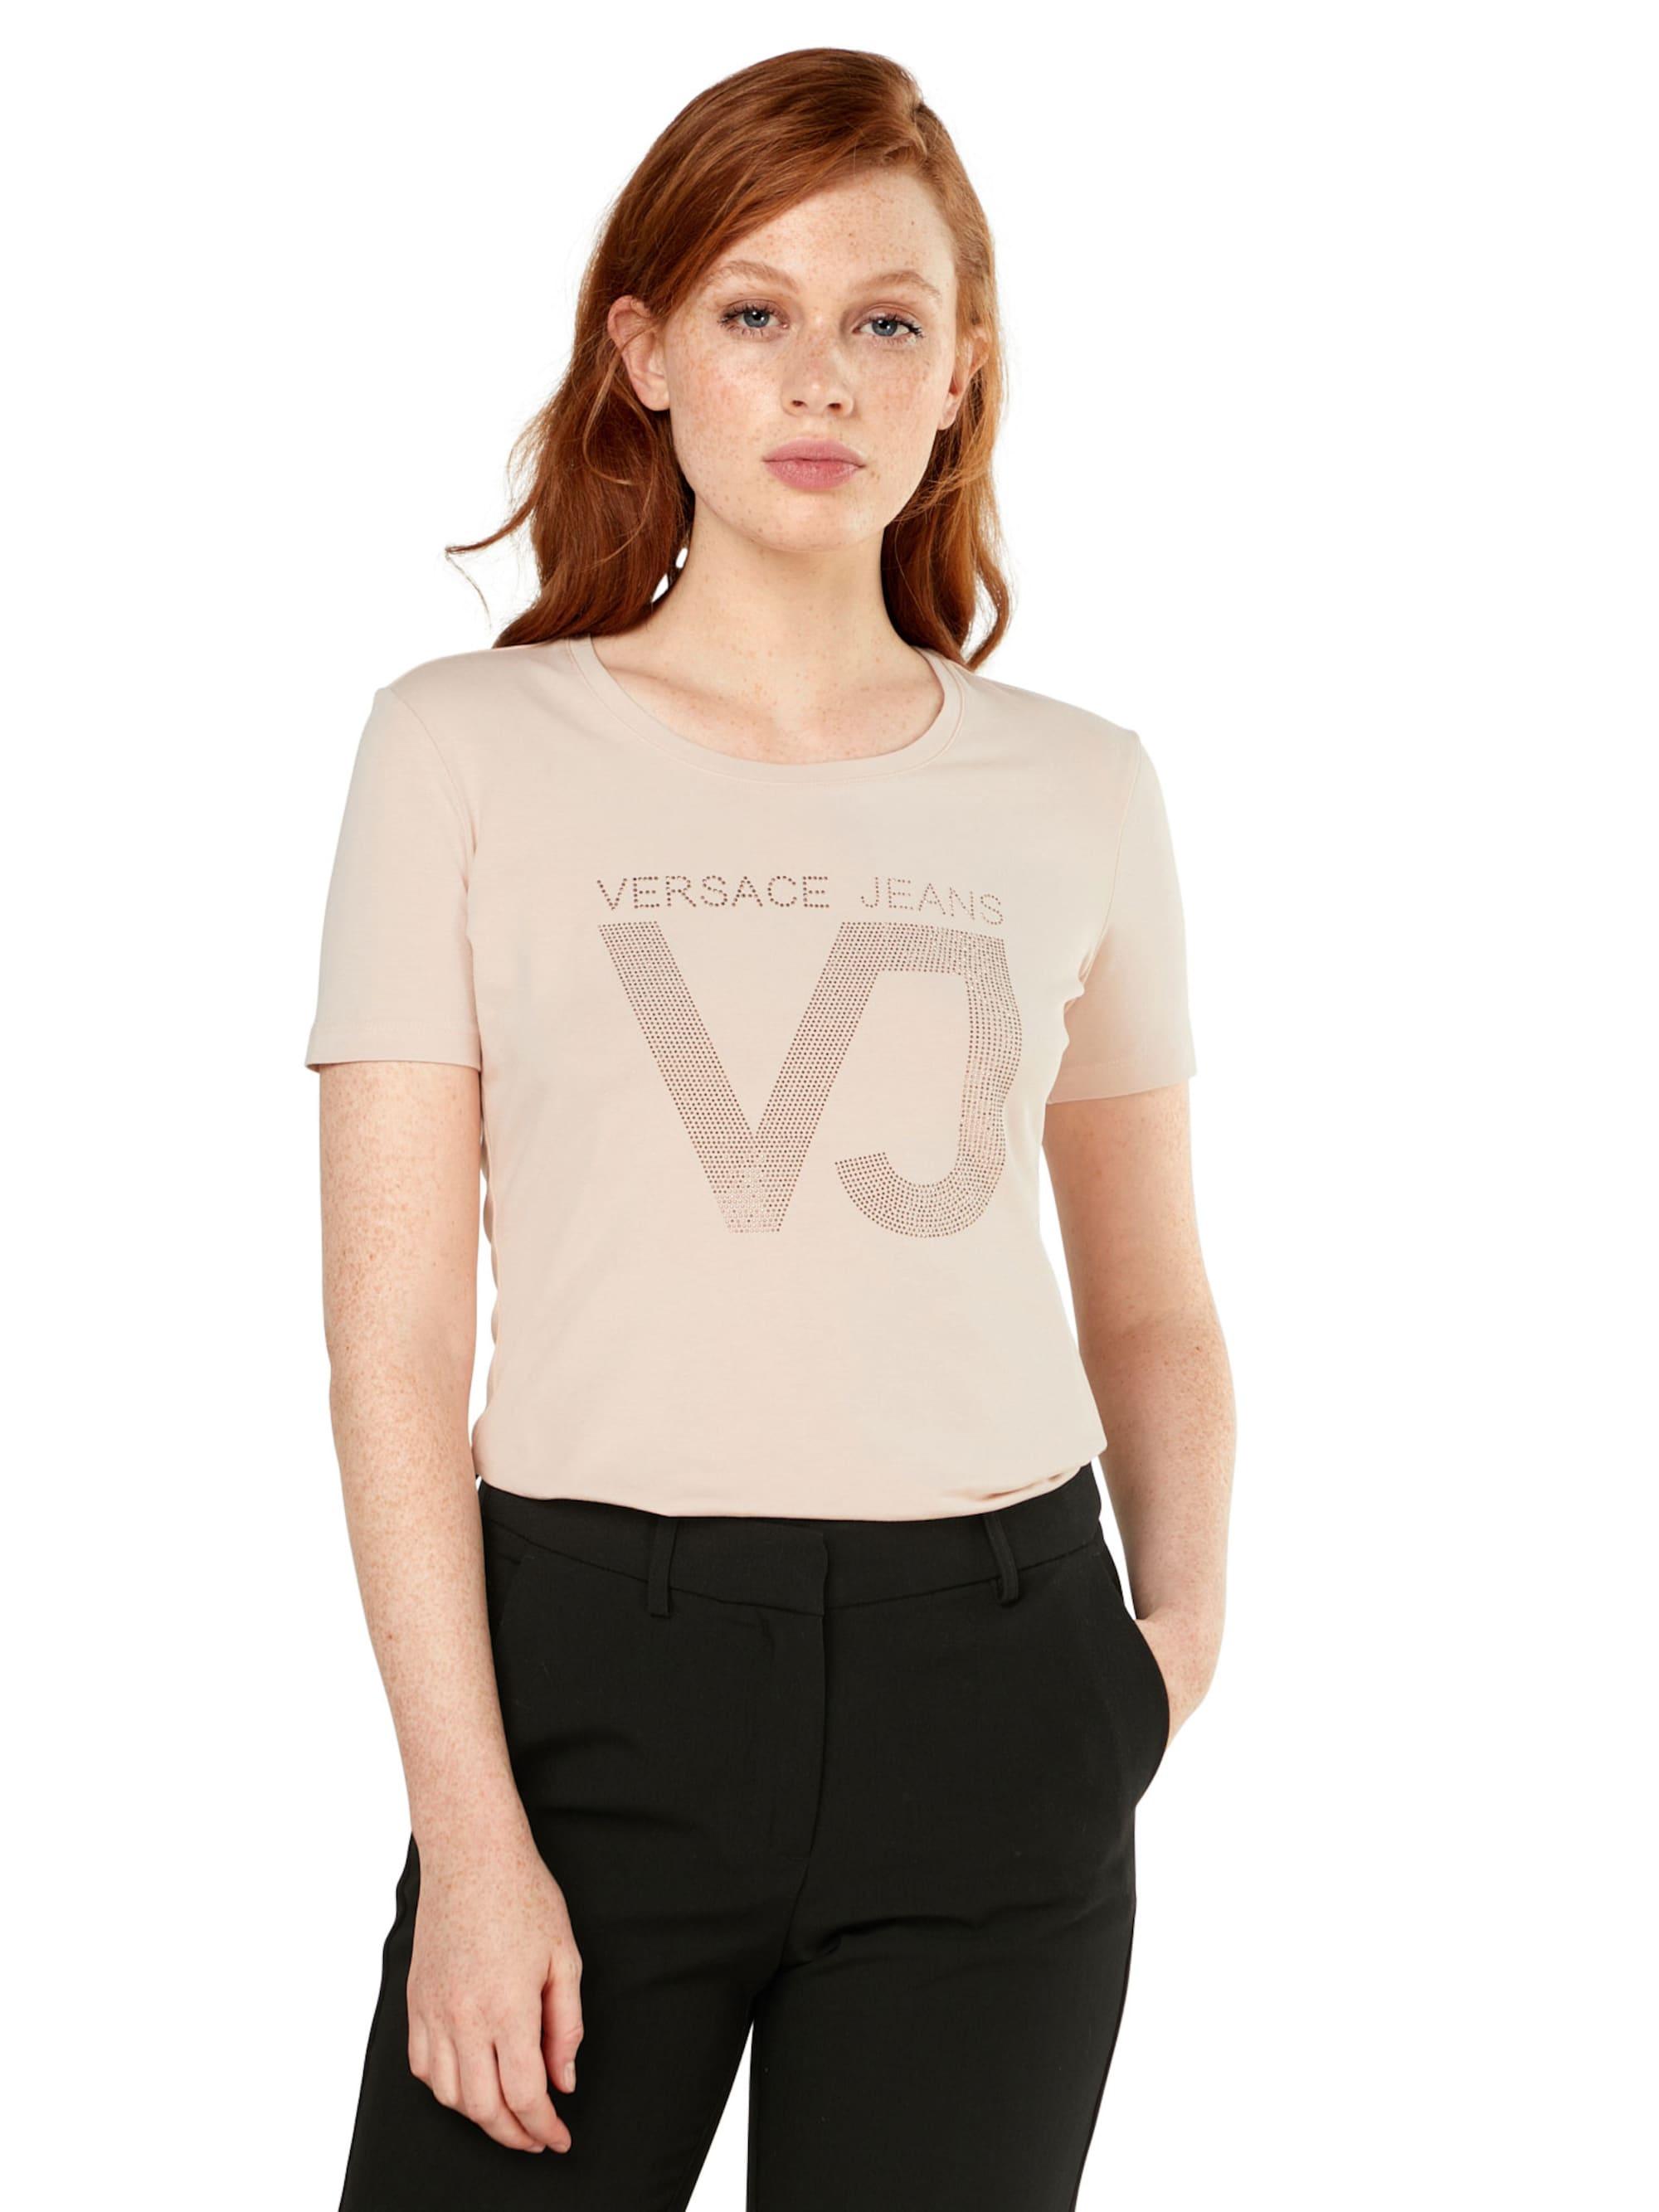 Versace Jeans Koszulka 'RDM606 45VJ'  pudrowy